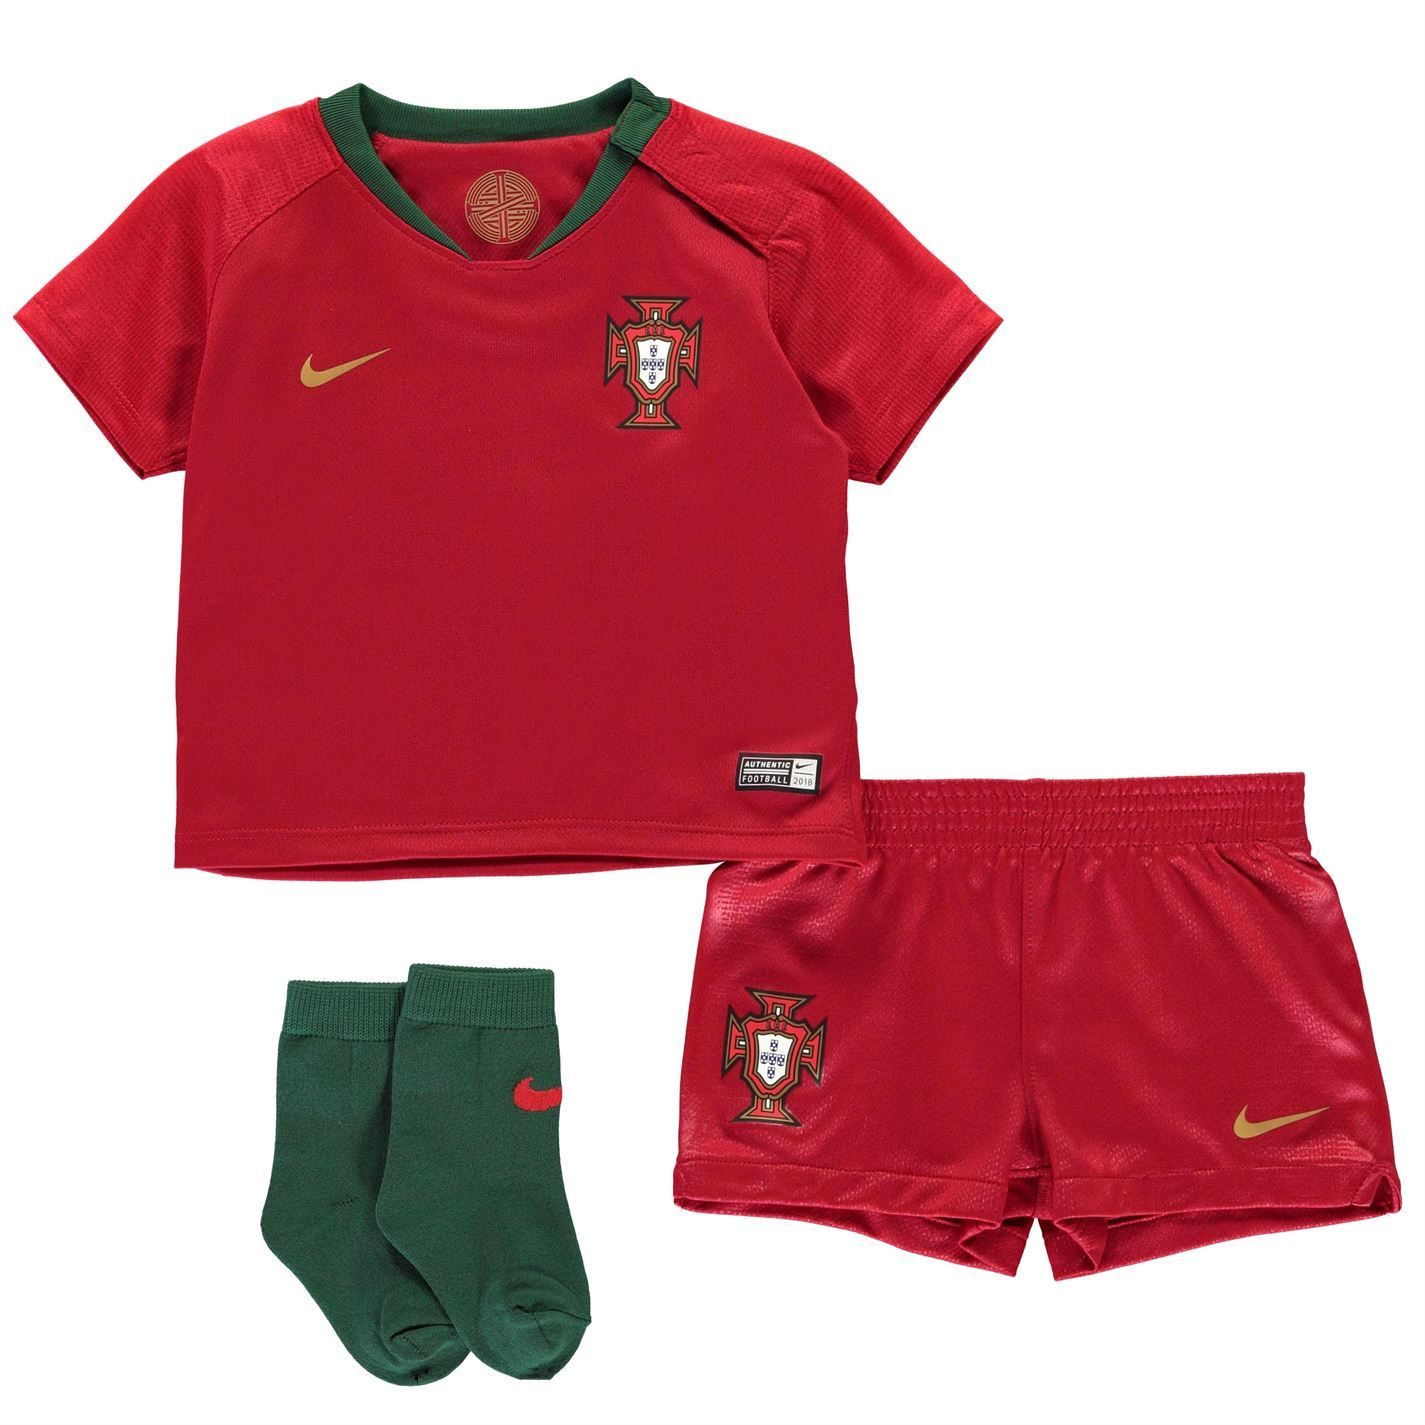 9e109d93e ... Nike Portugal Home Baby Kit 2018 Infants Red Football Soccer Top Shirt  Strip ...